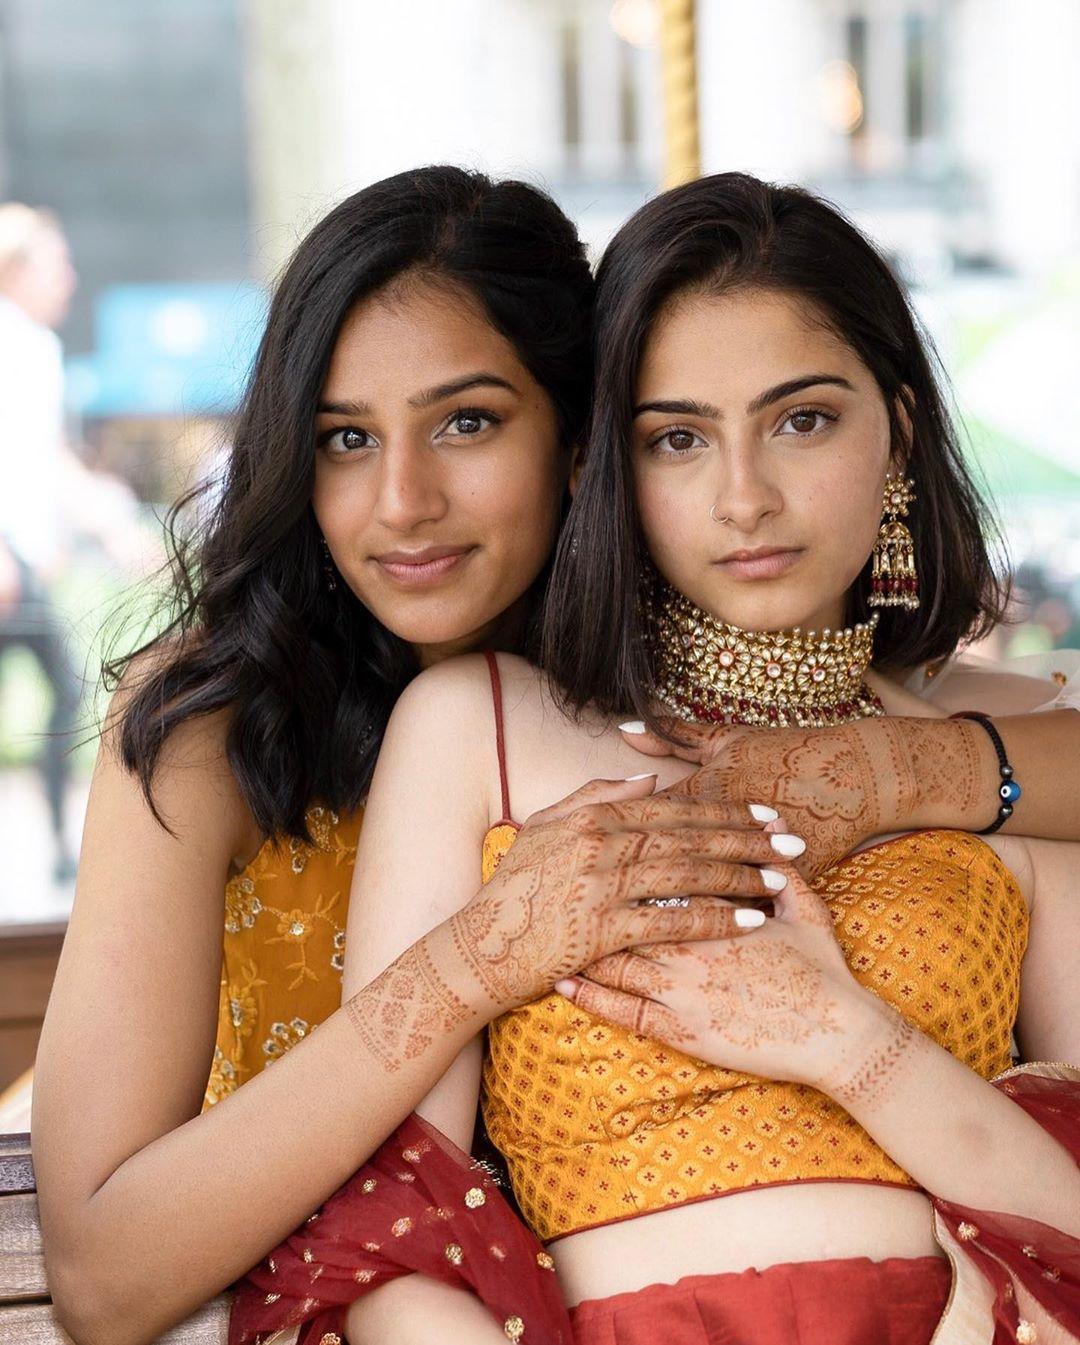 hindu muslim lesbian couple photoshoot